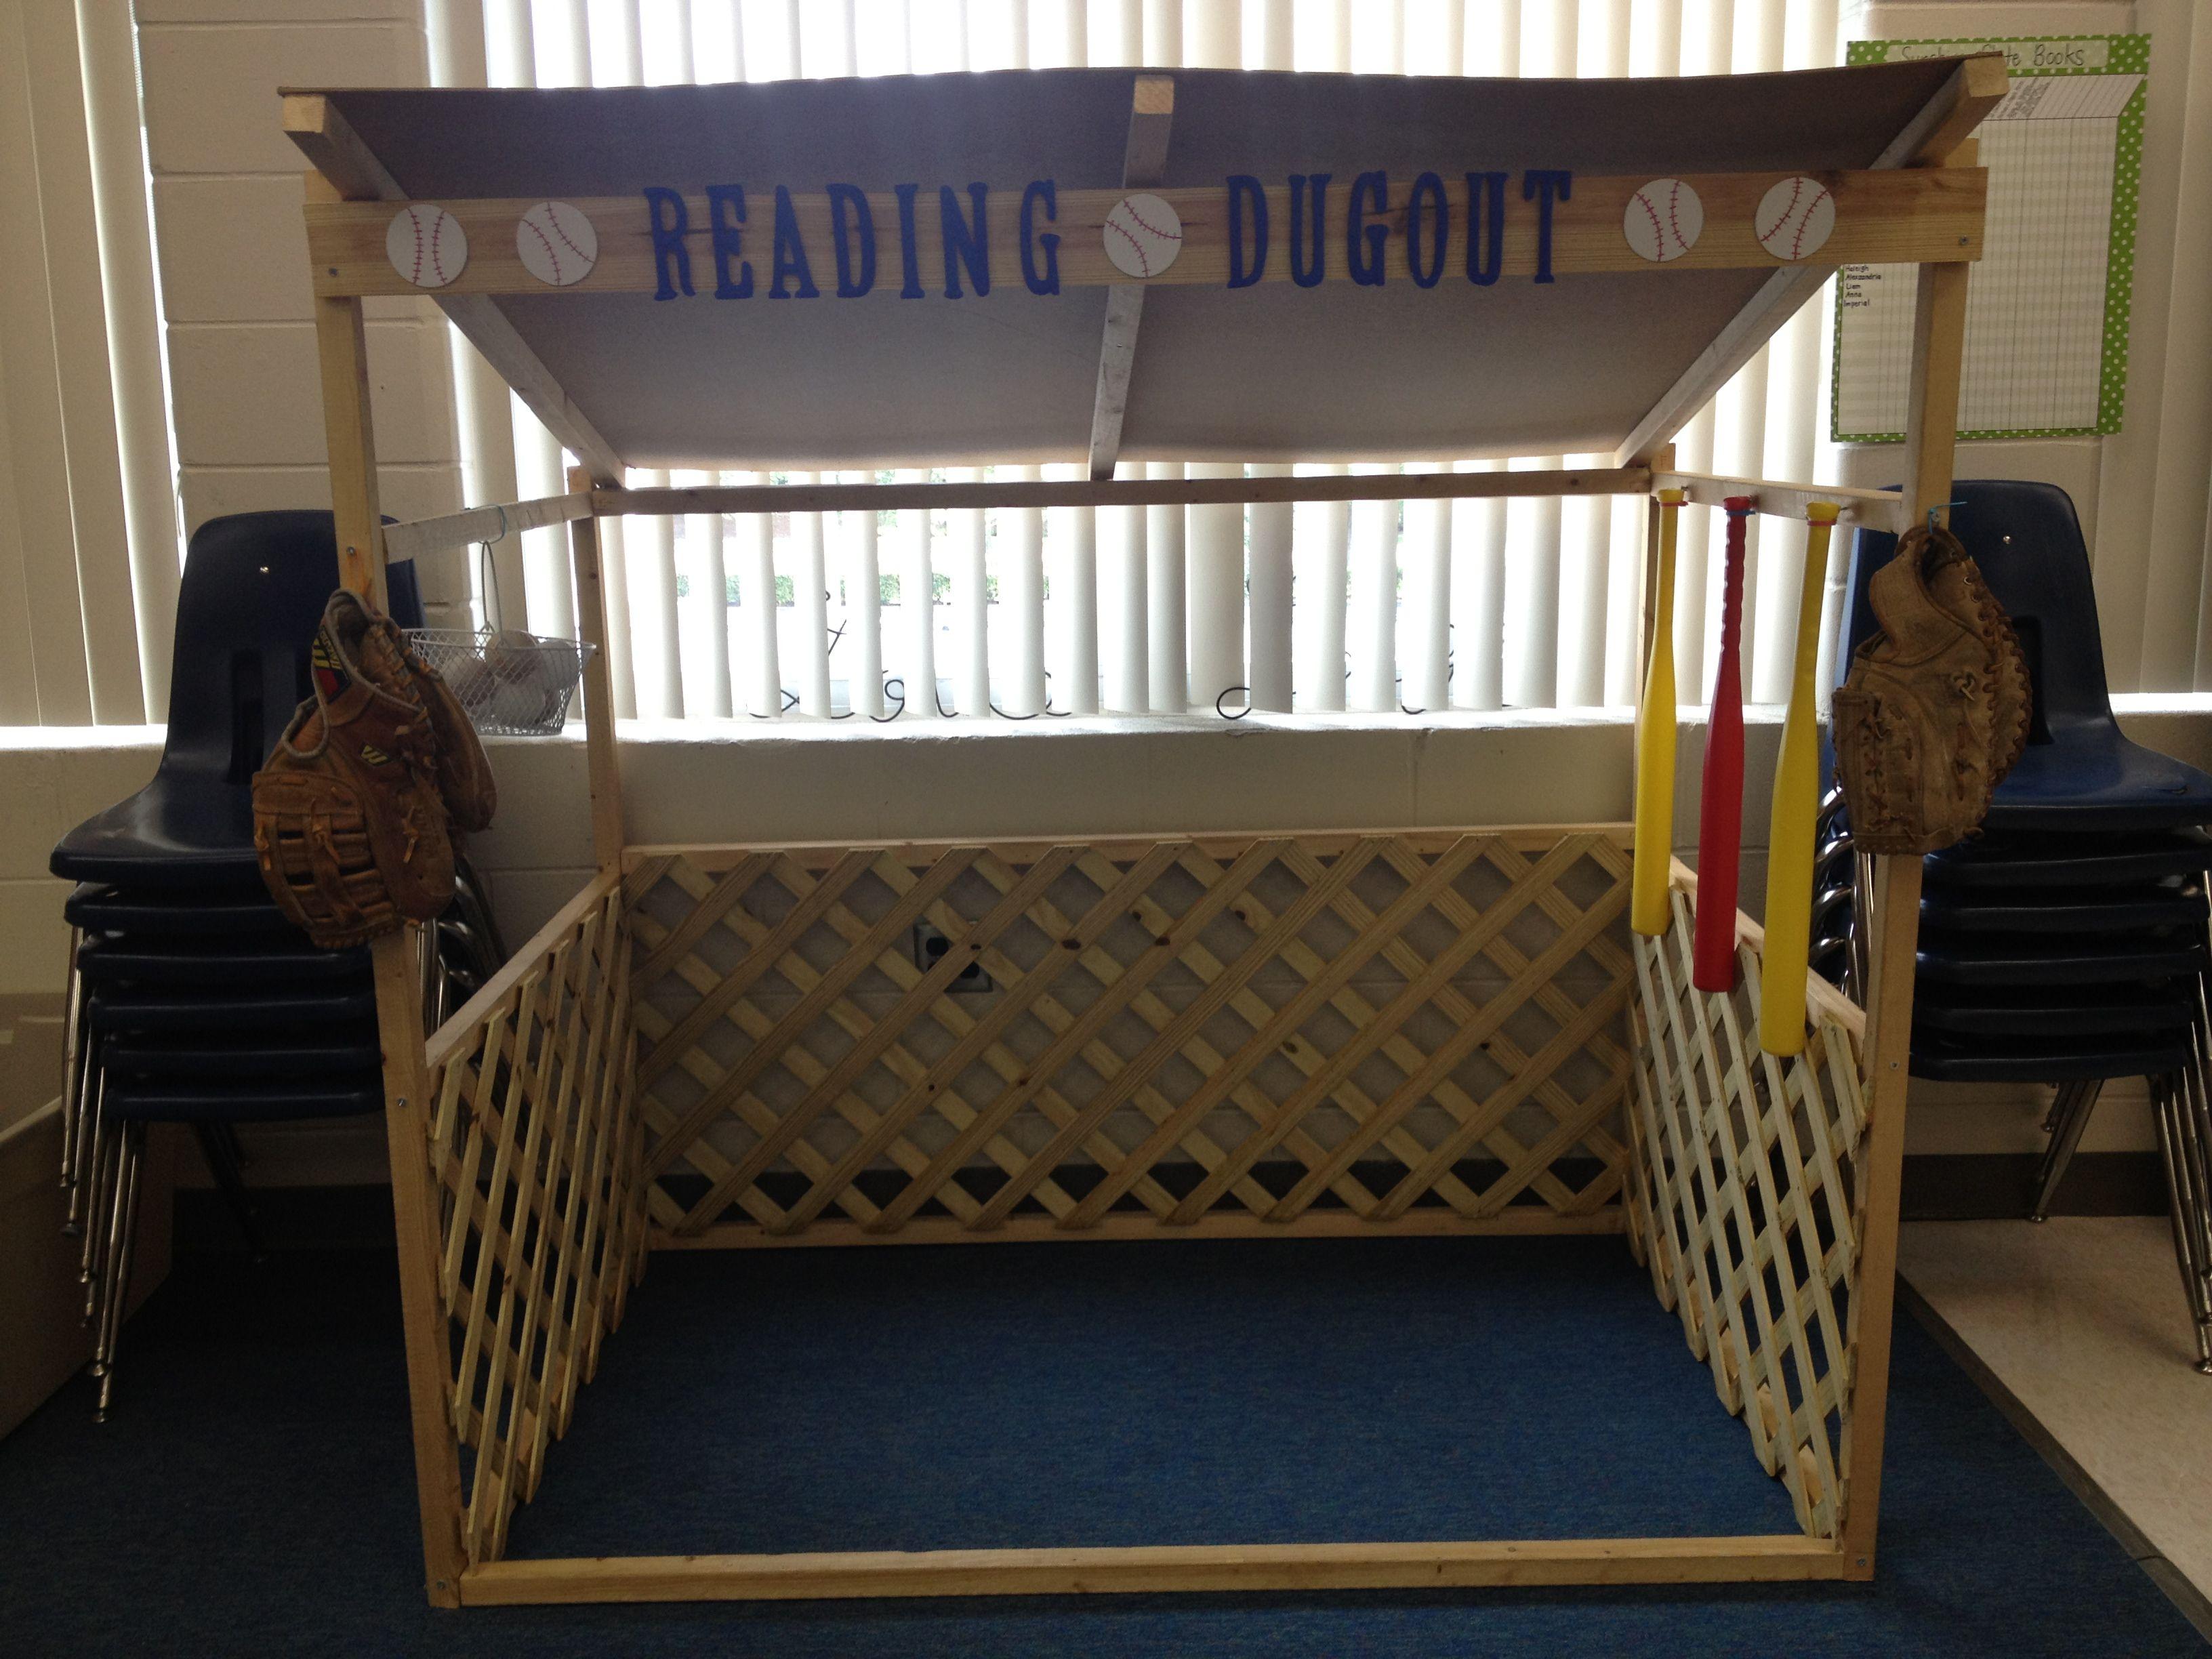 Baseball Dugout Bedroom Designs: Reading Dugout For Baseball Themed Classroom!